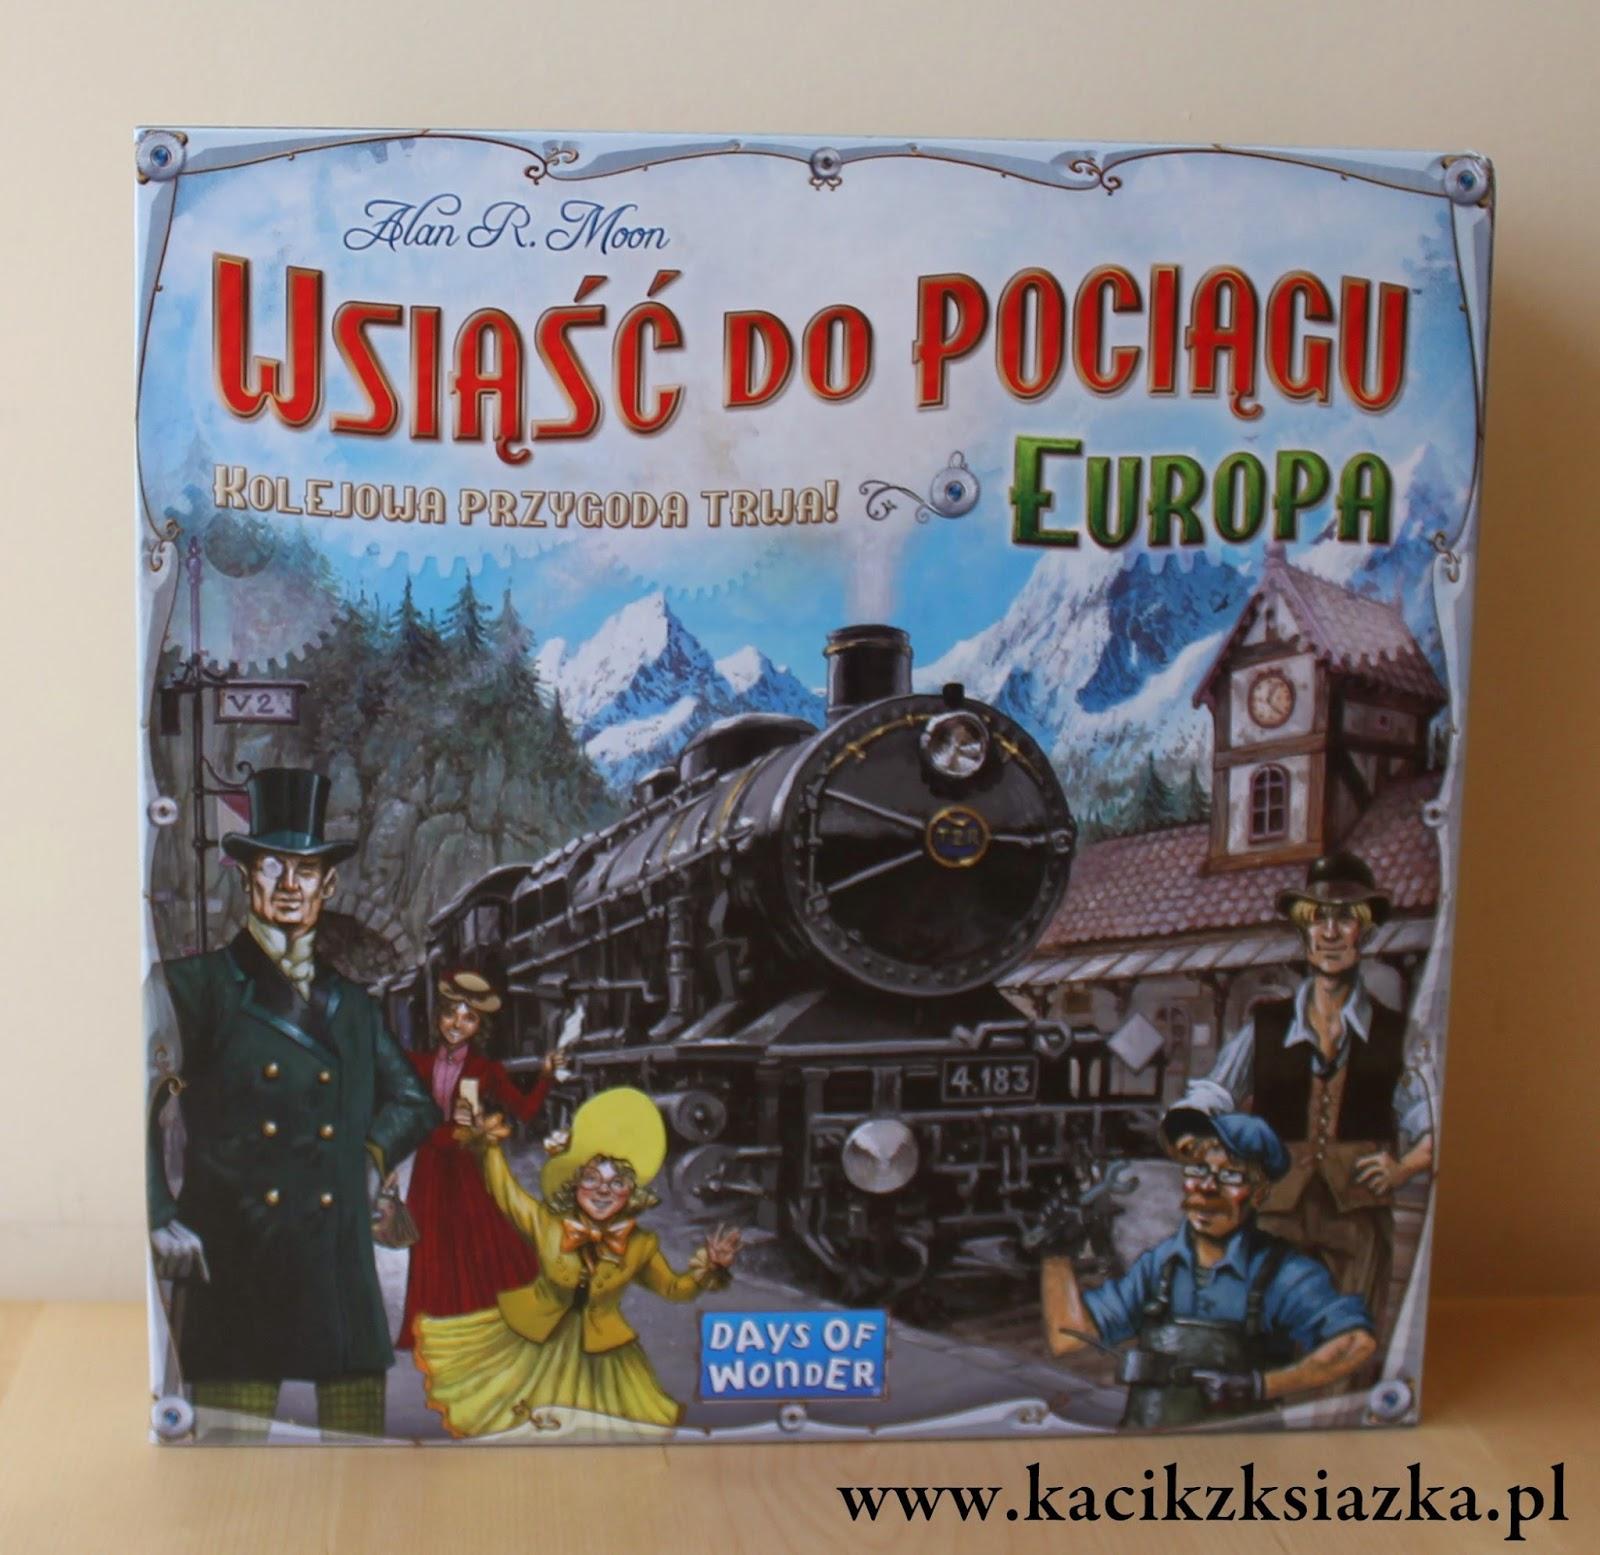 http://www.kacikzksiazka.pl/2014/10/wsiasc-do-pociagu-europa-recenzja.html